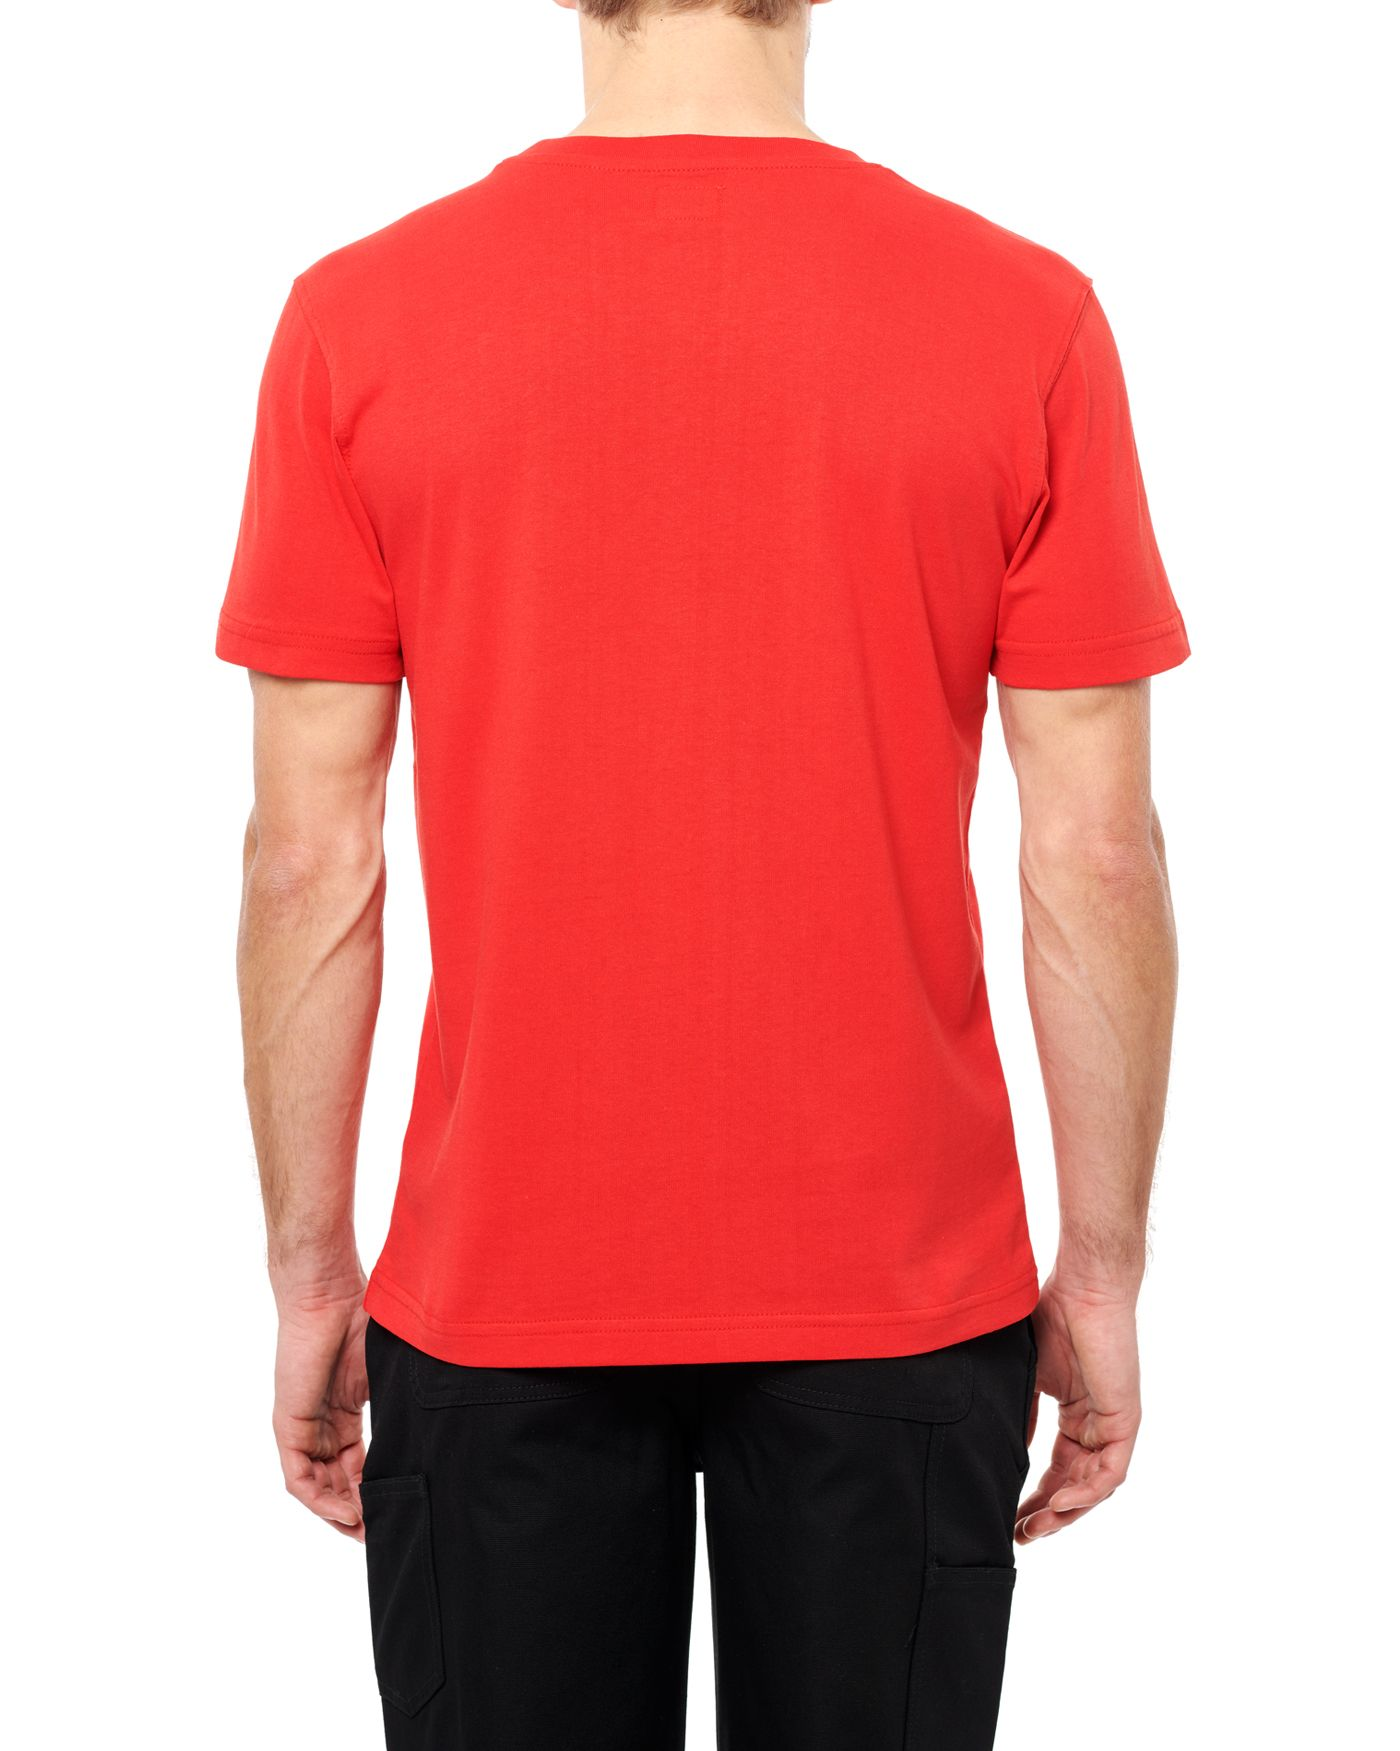 Photo of Bob Cat S/S T-shirt, Red